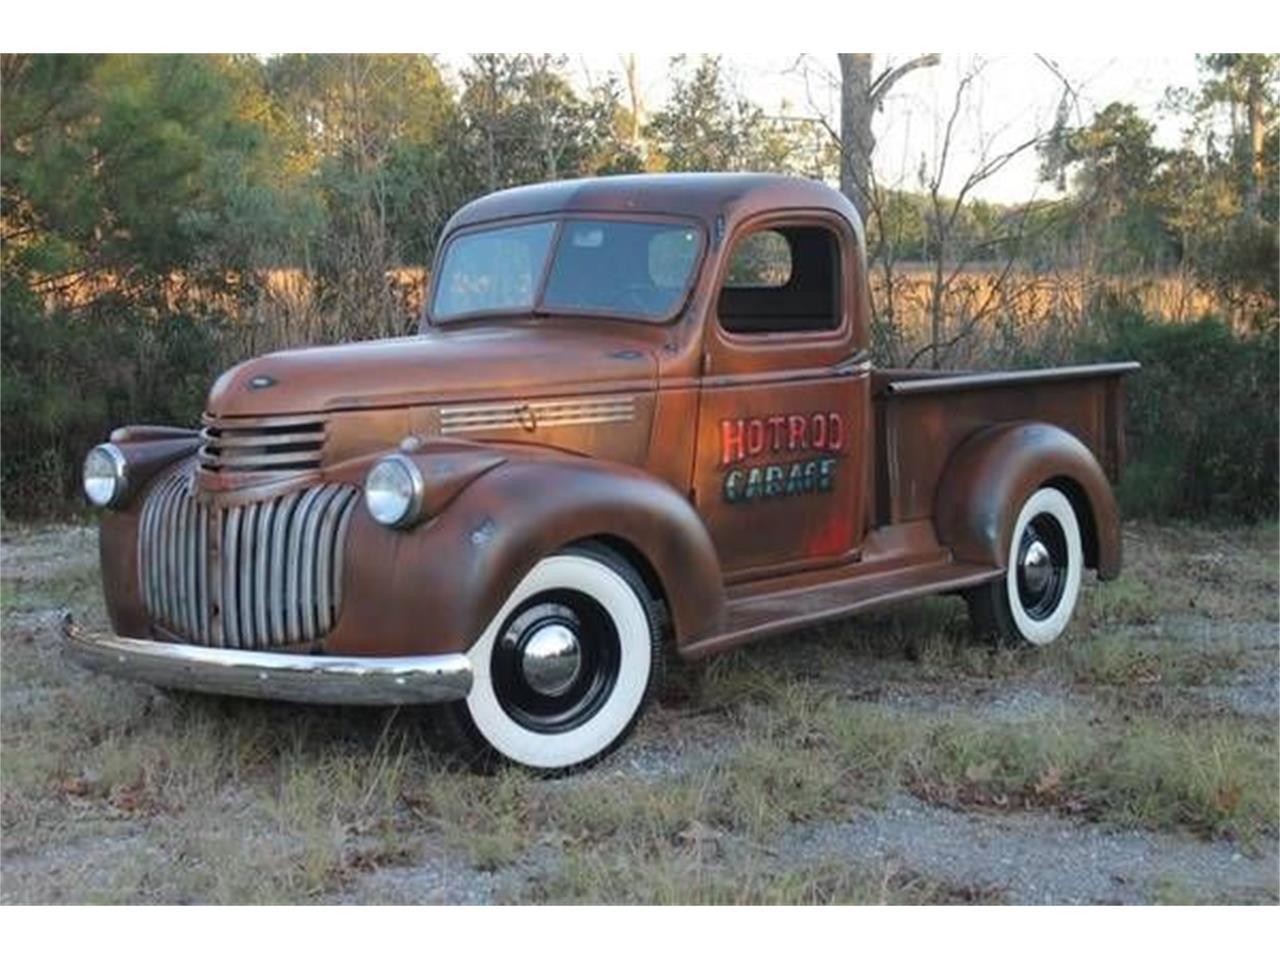 1942 Chevrolet Pickup For Sale Classiccars Com Cc 1189602